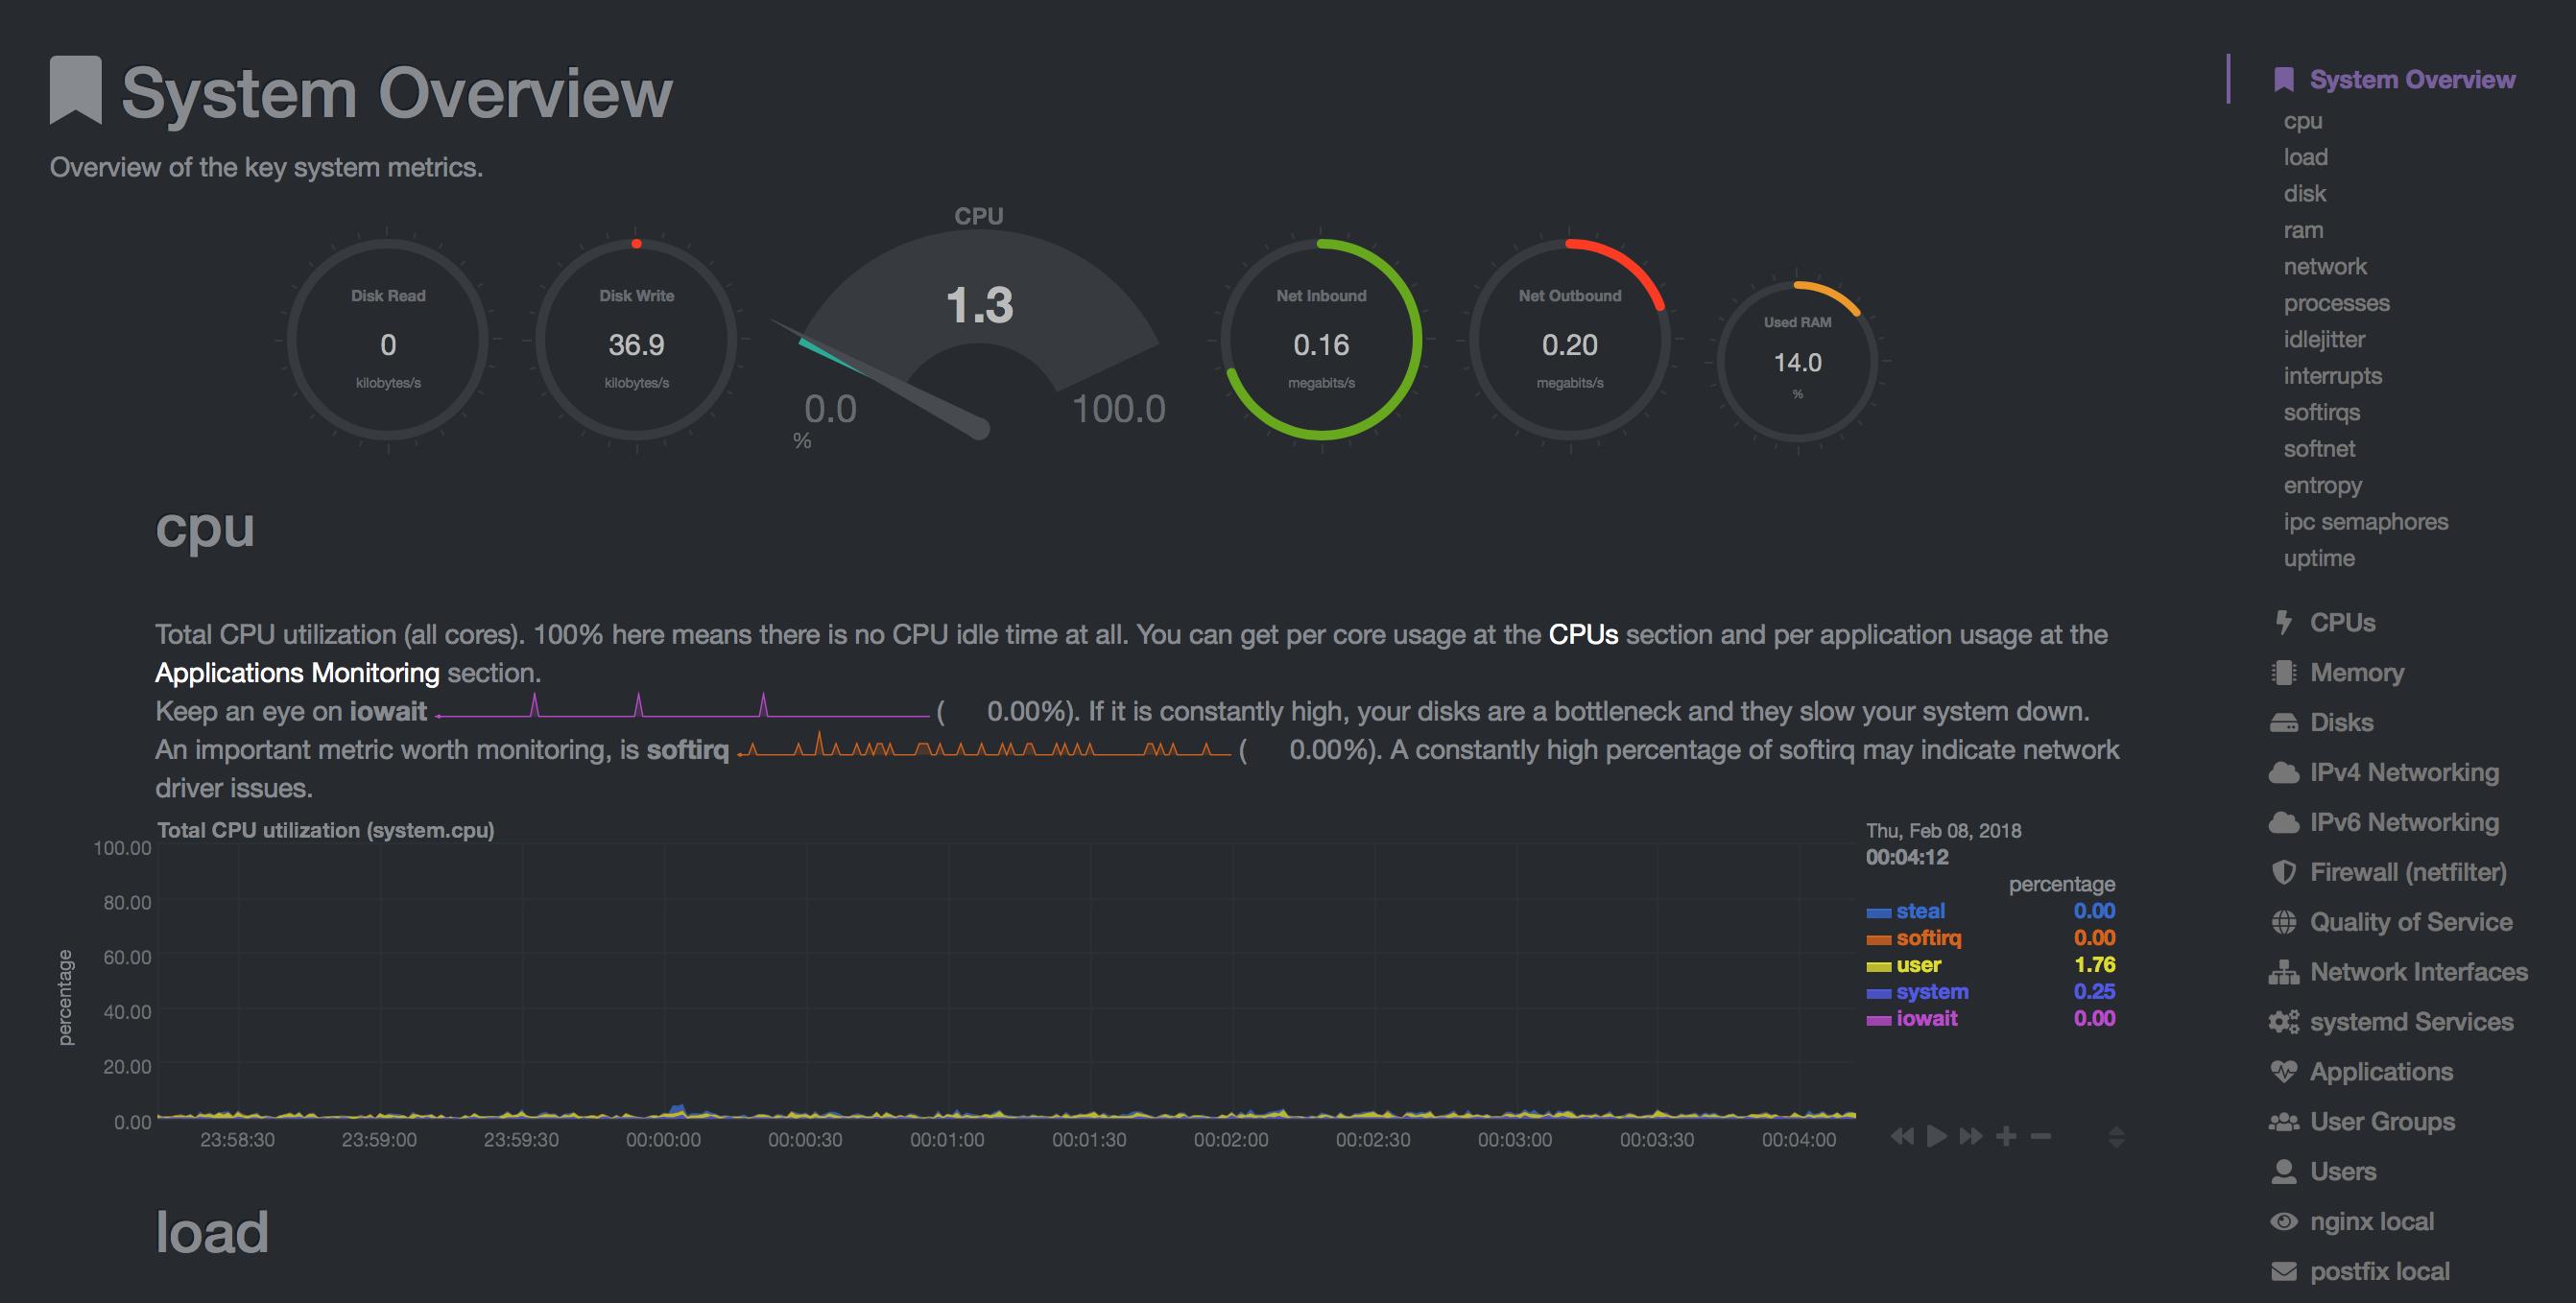 Integrate netdata monitor (on Linux server)